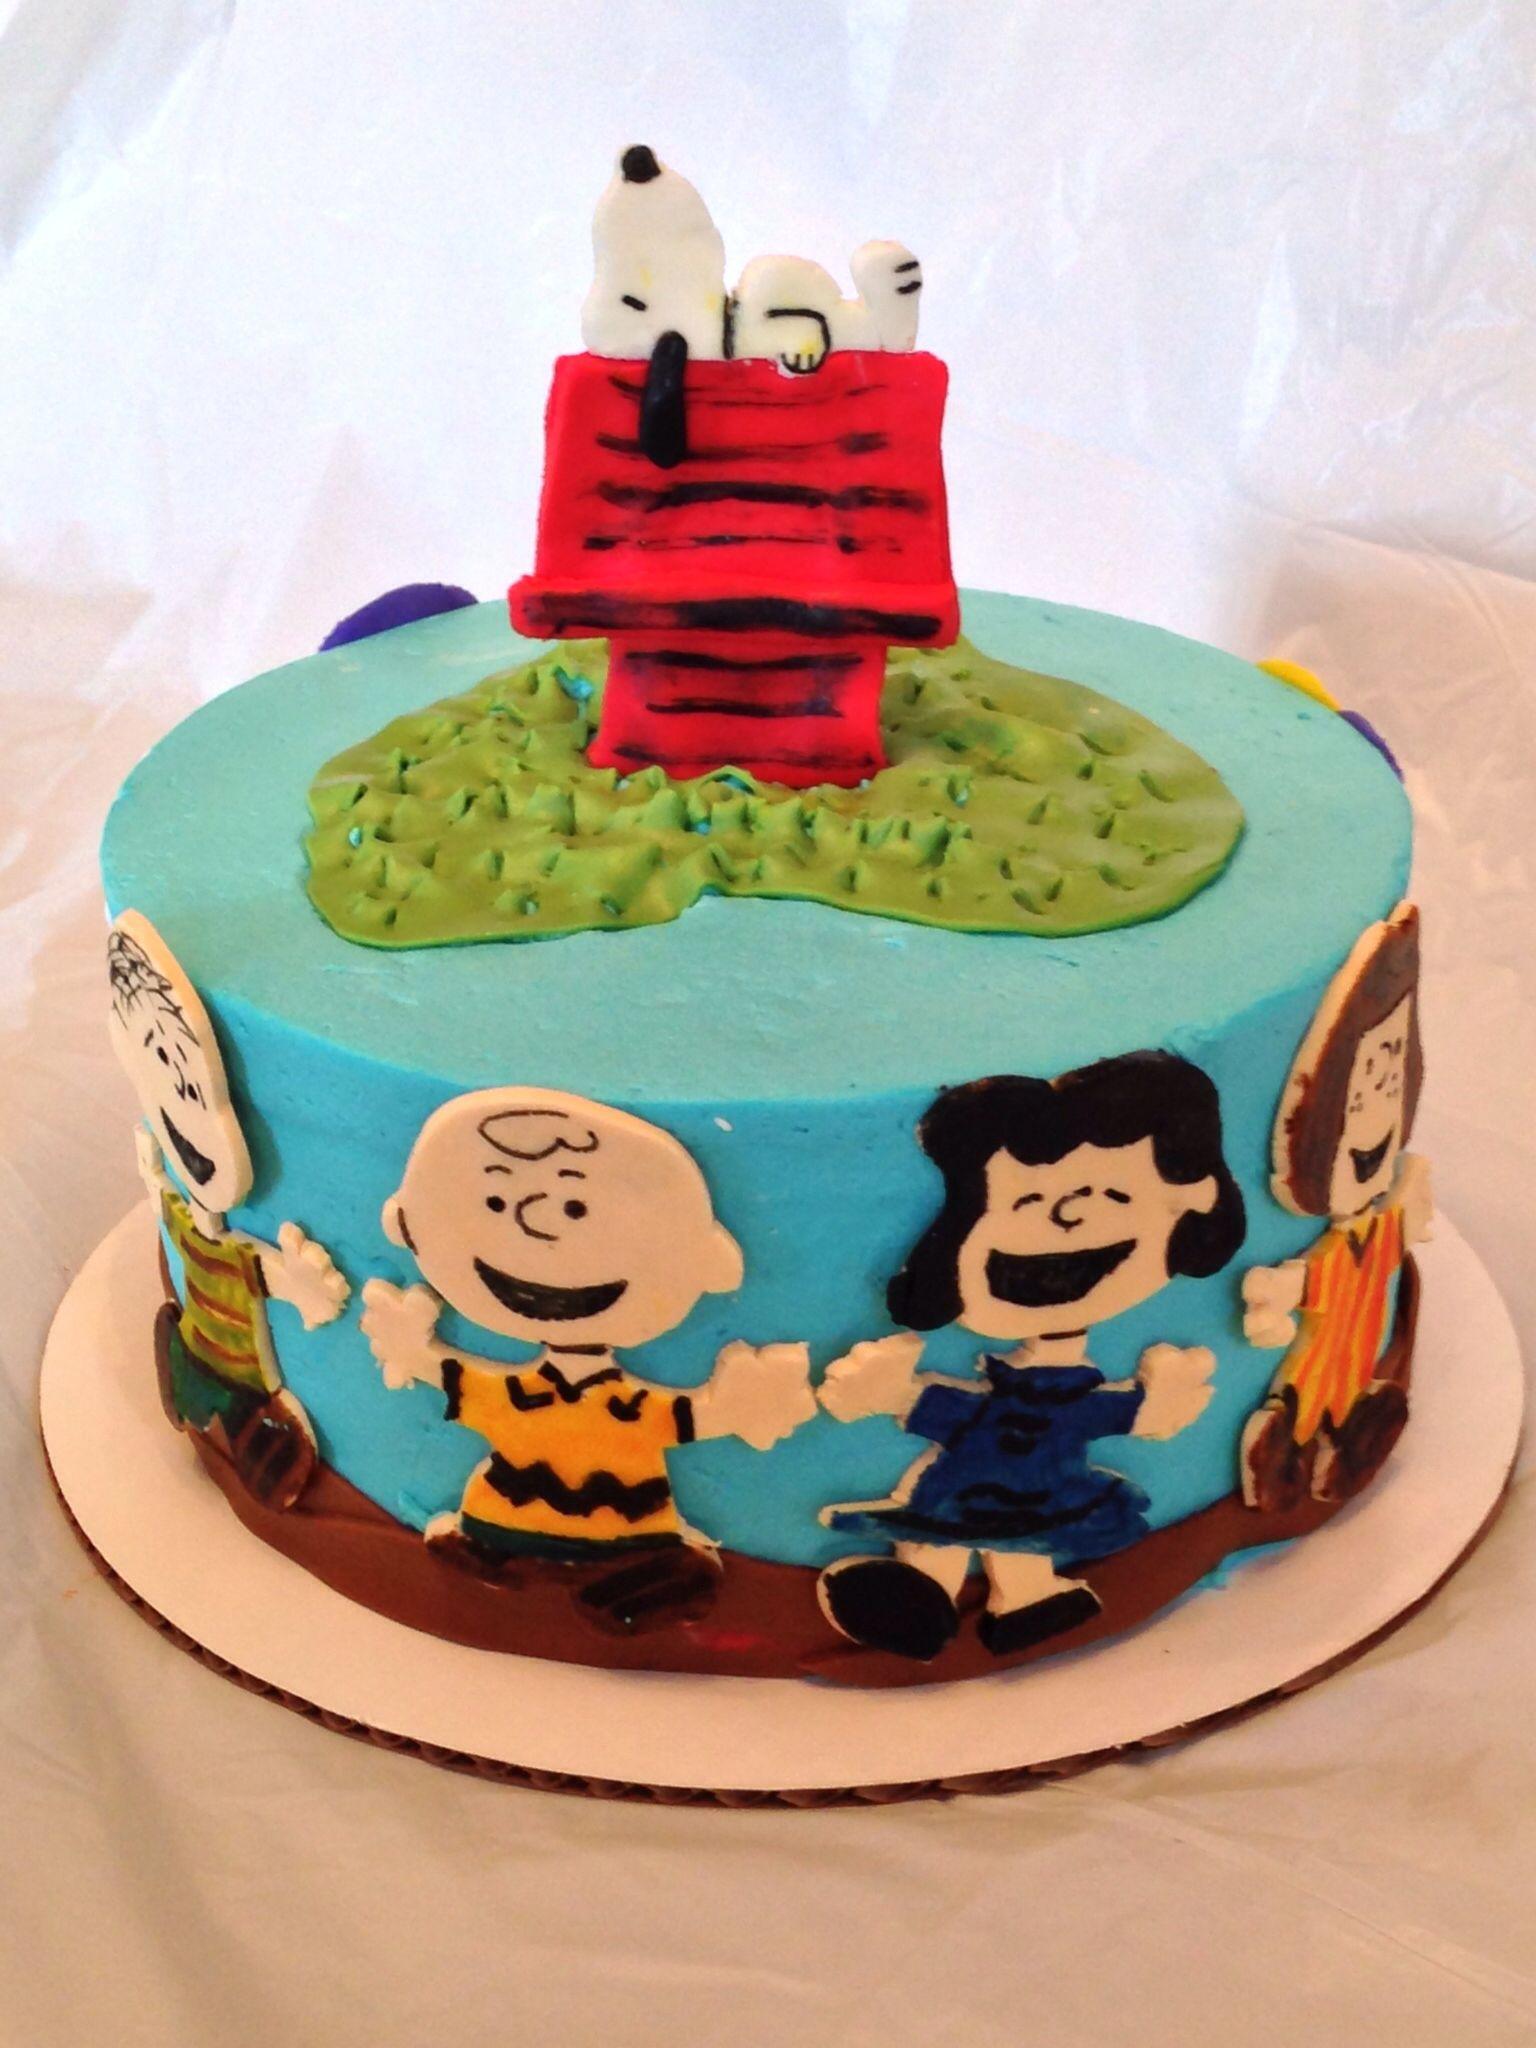 Peanuts Themed Birthday Cake